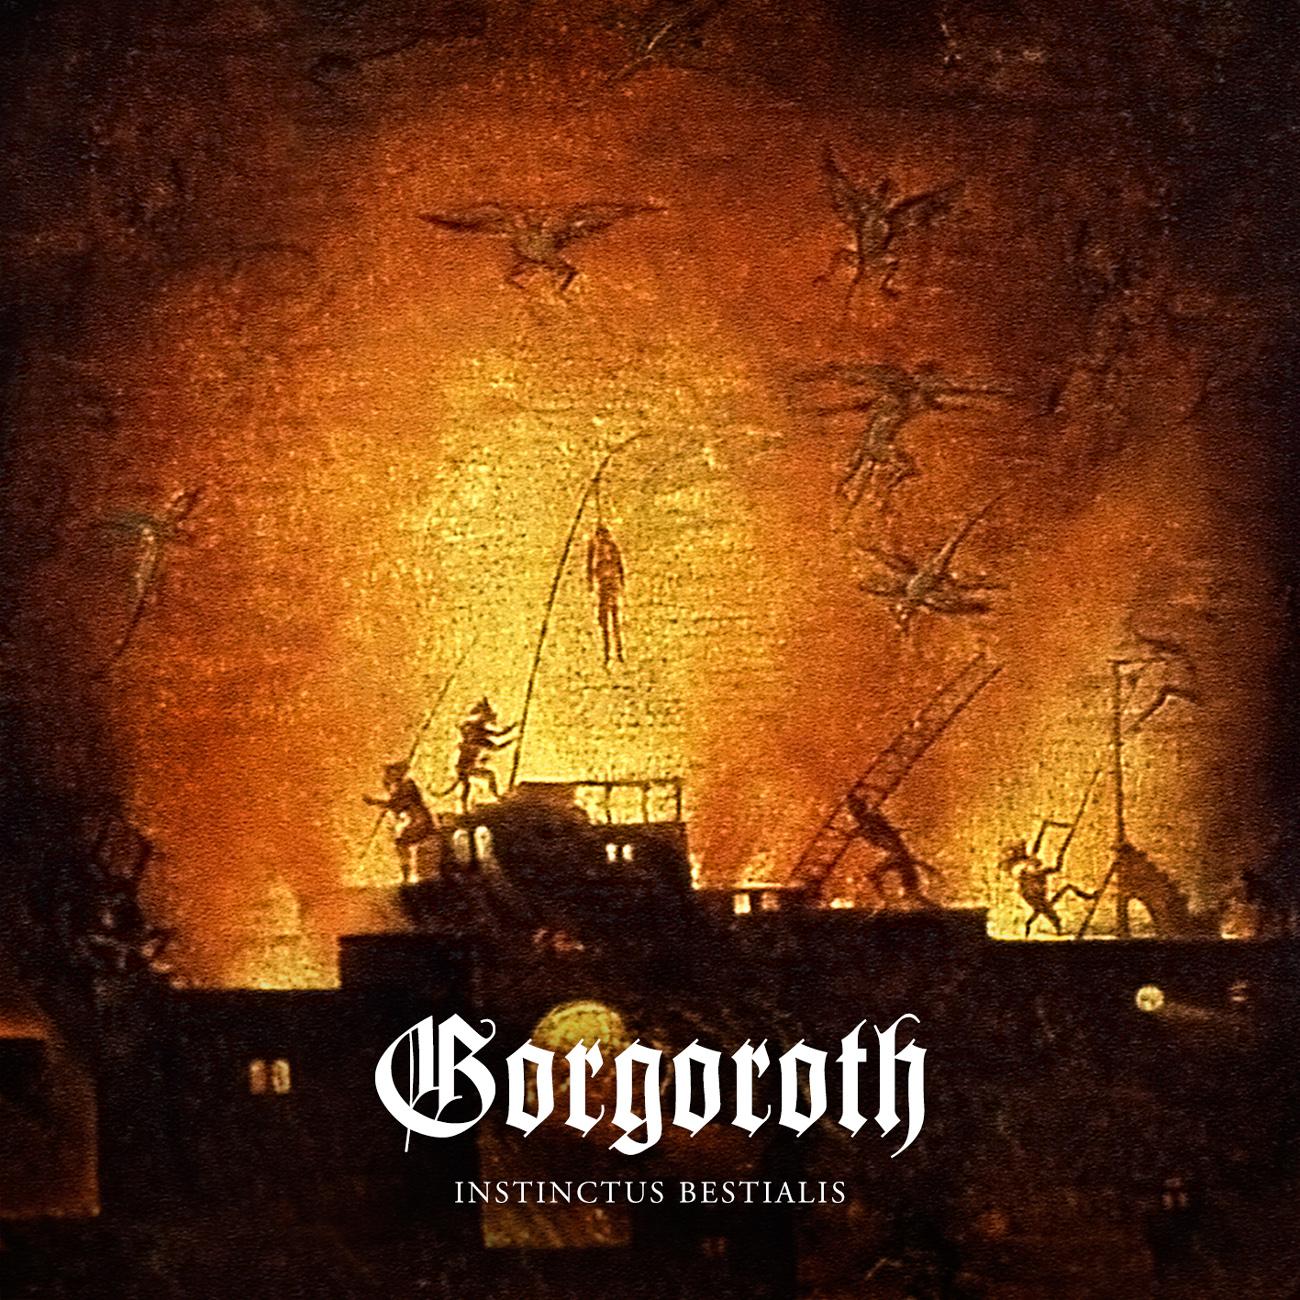 Gorgoroth – Instinctus Bestialis Review